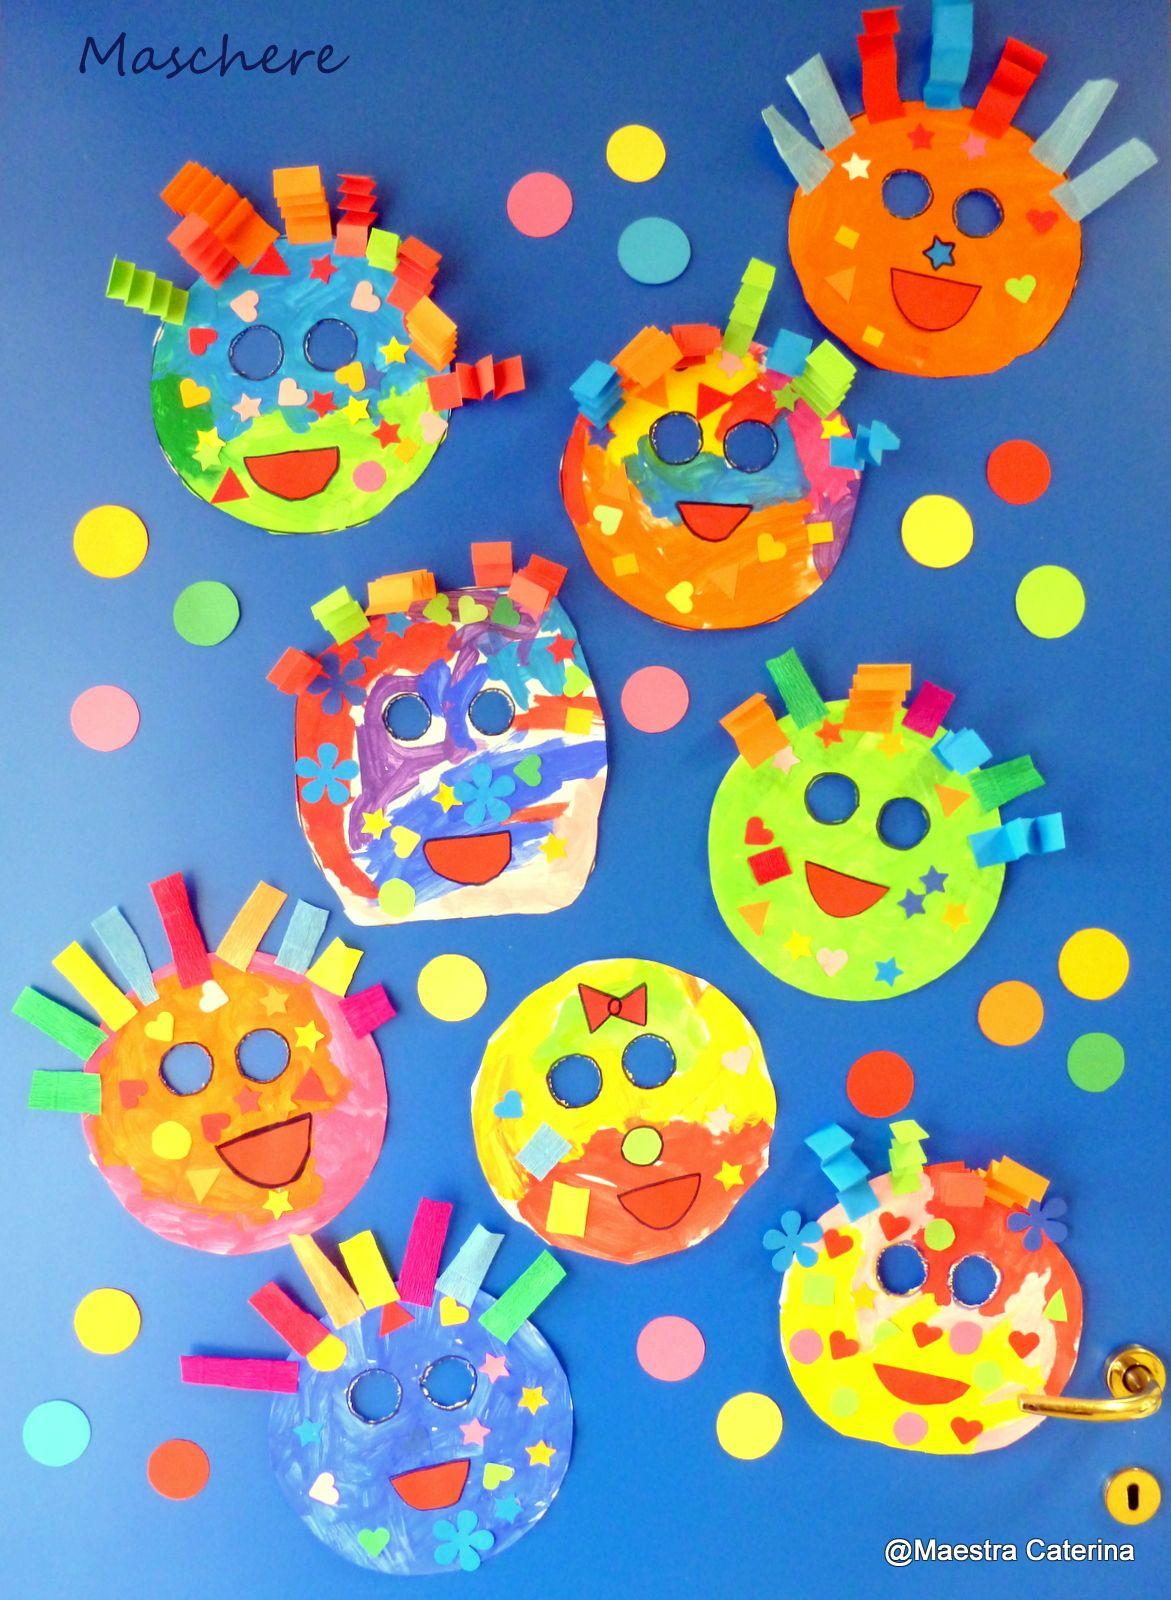 Maestra Caterina Carnevale Karneval Fasching Clown Zirkus